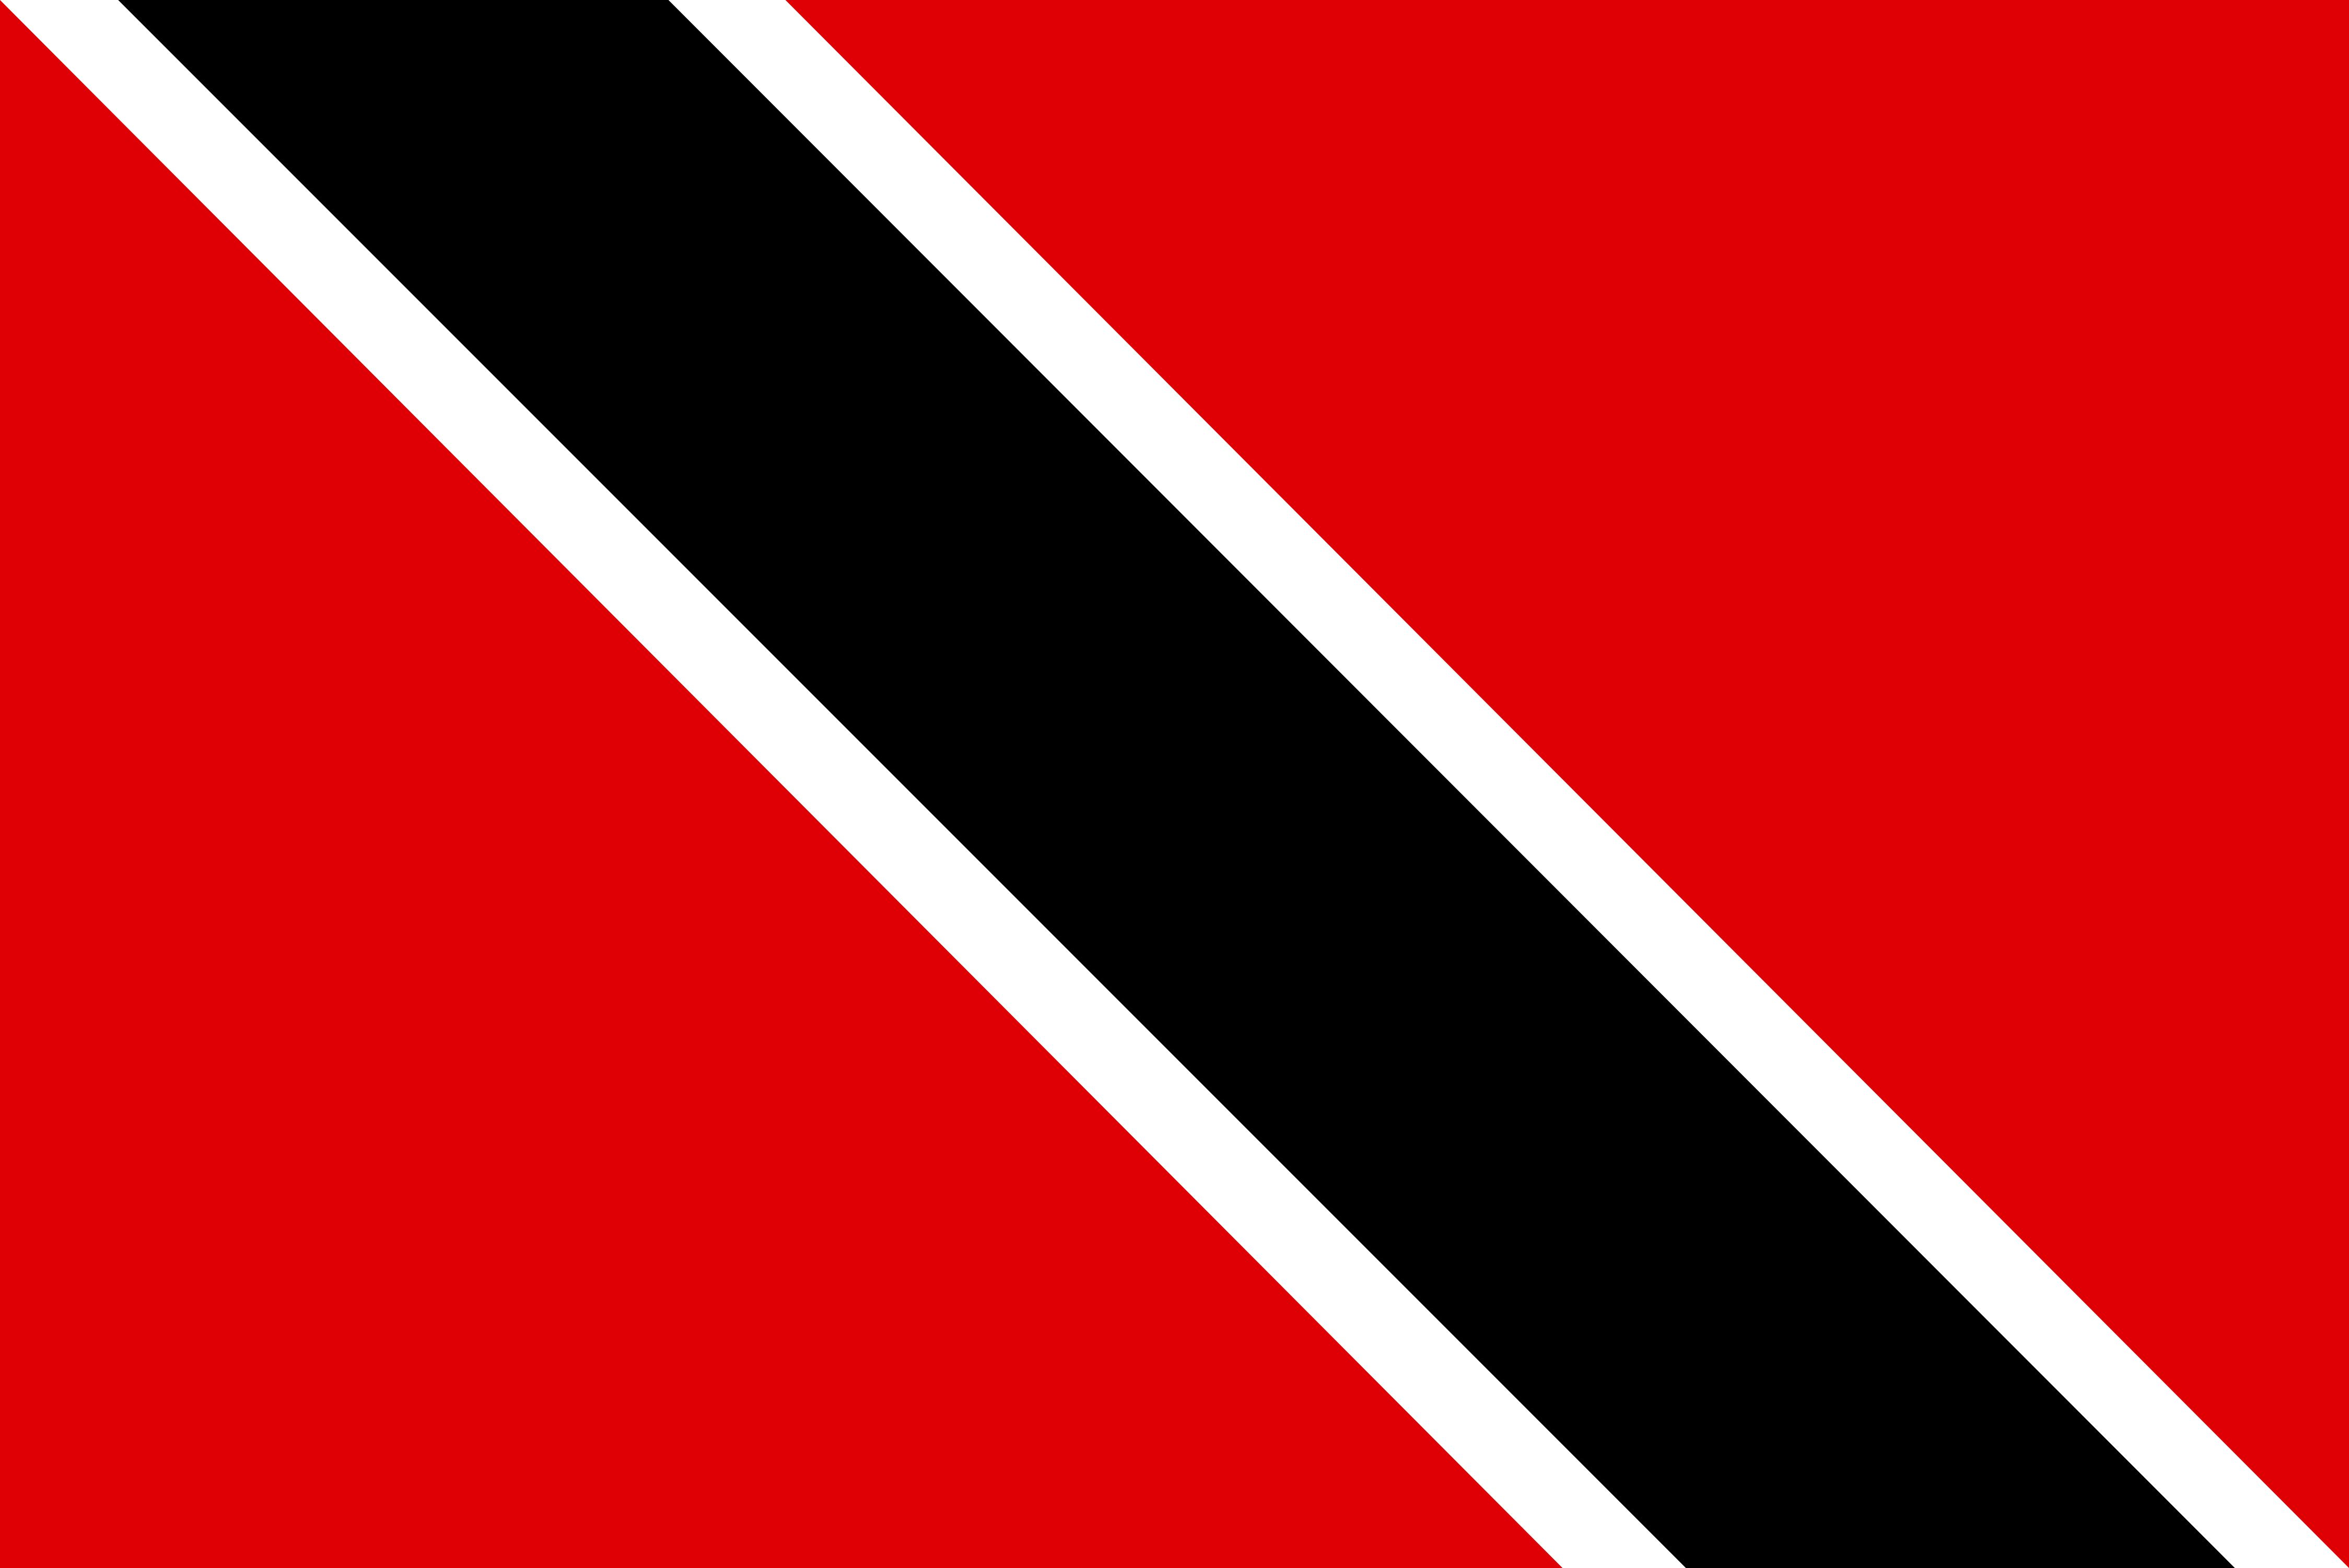 Trinidad flag | Flags & Travel Posters | Pinterest: pinterest.com/pin/423831014903898394